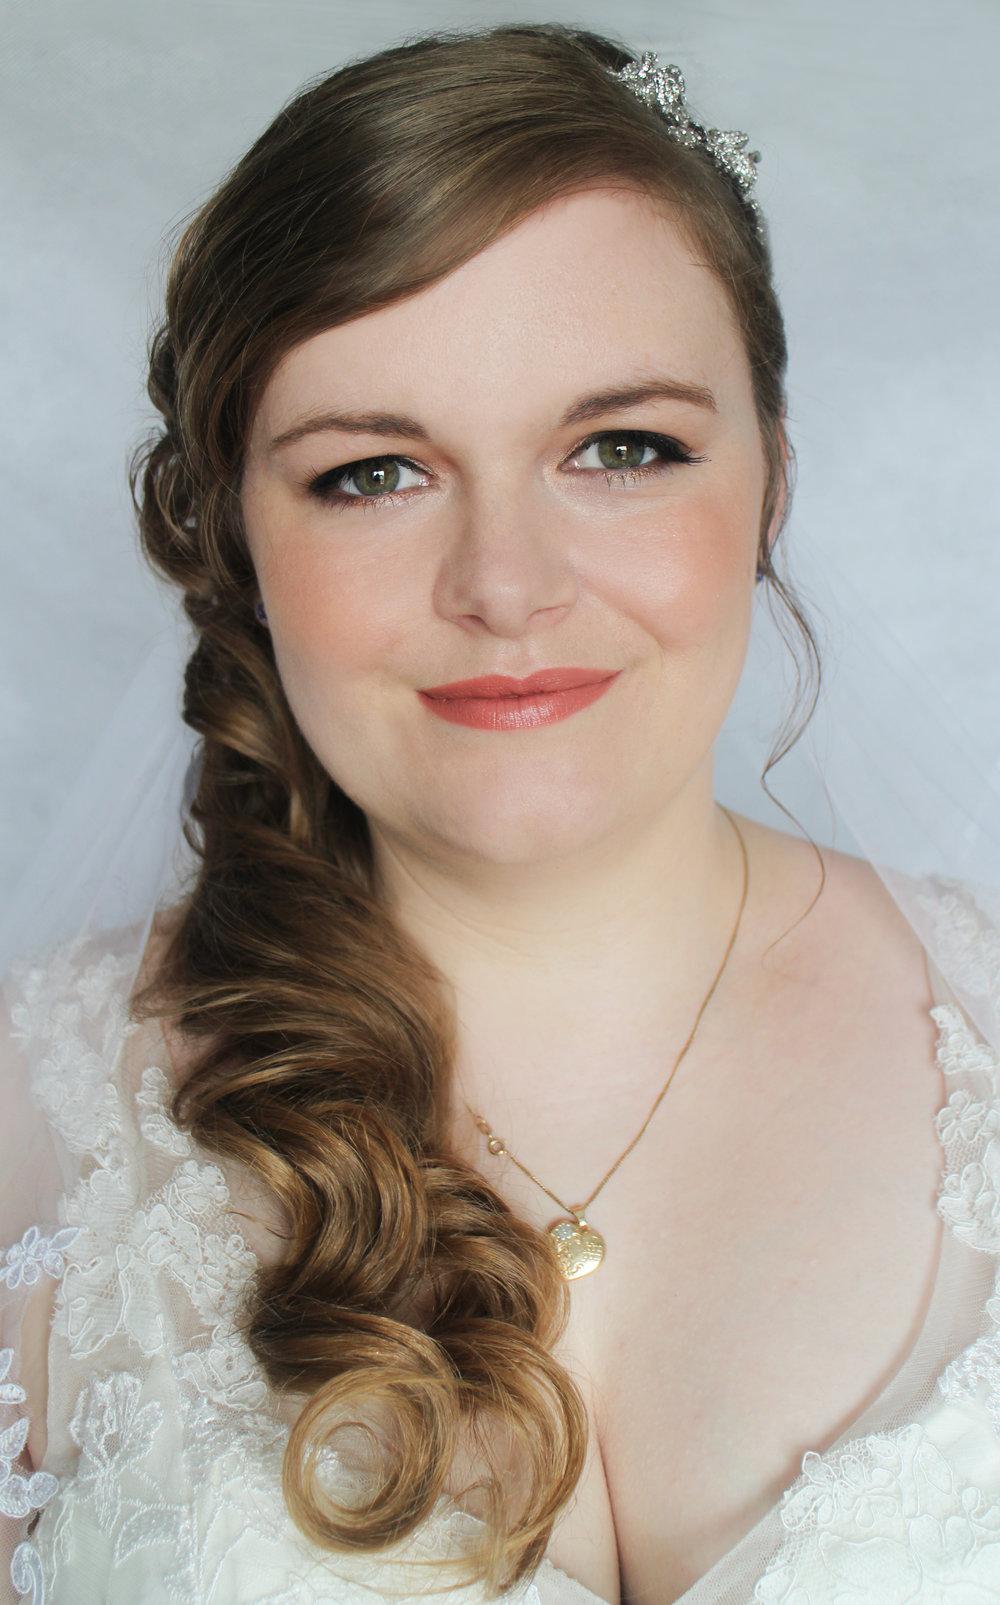 Photo/hair and makeup - Nicola Honey Artistry